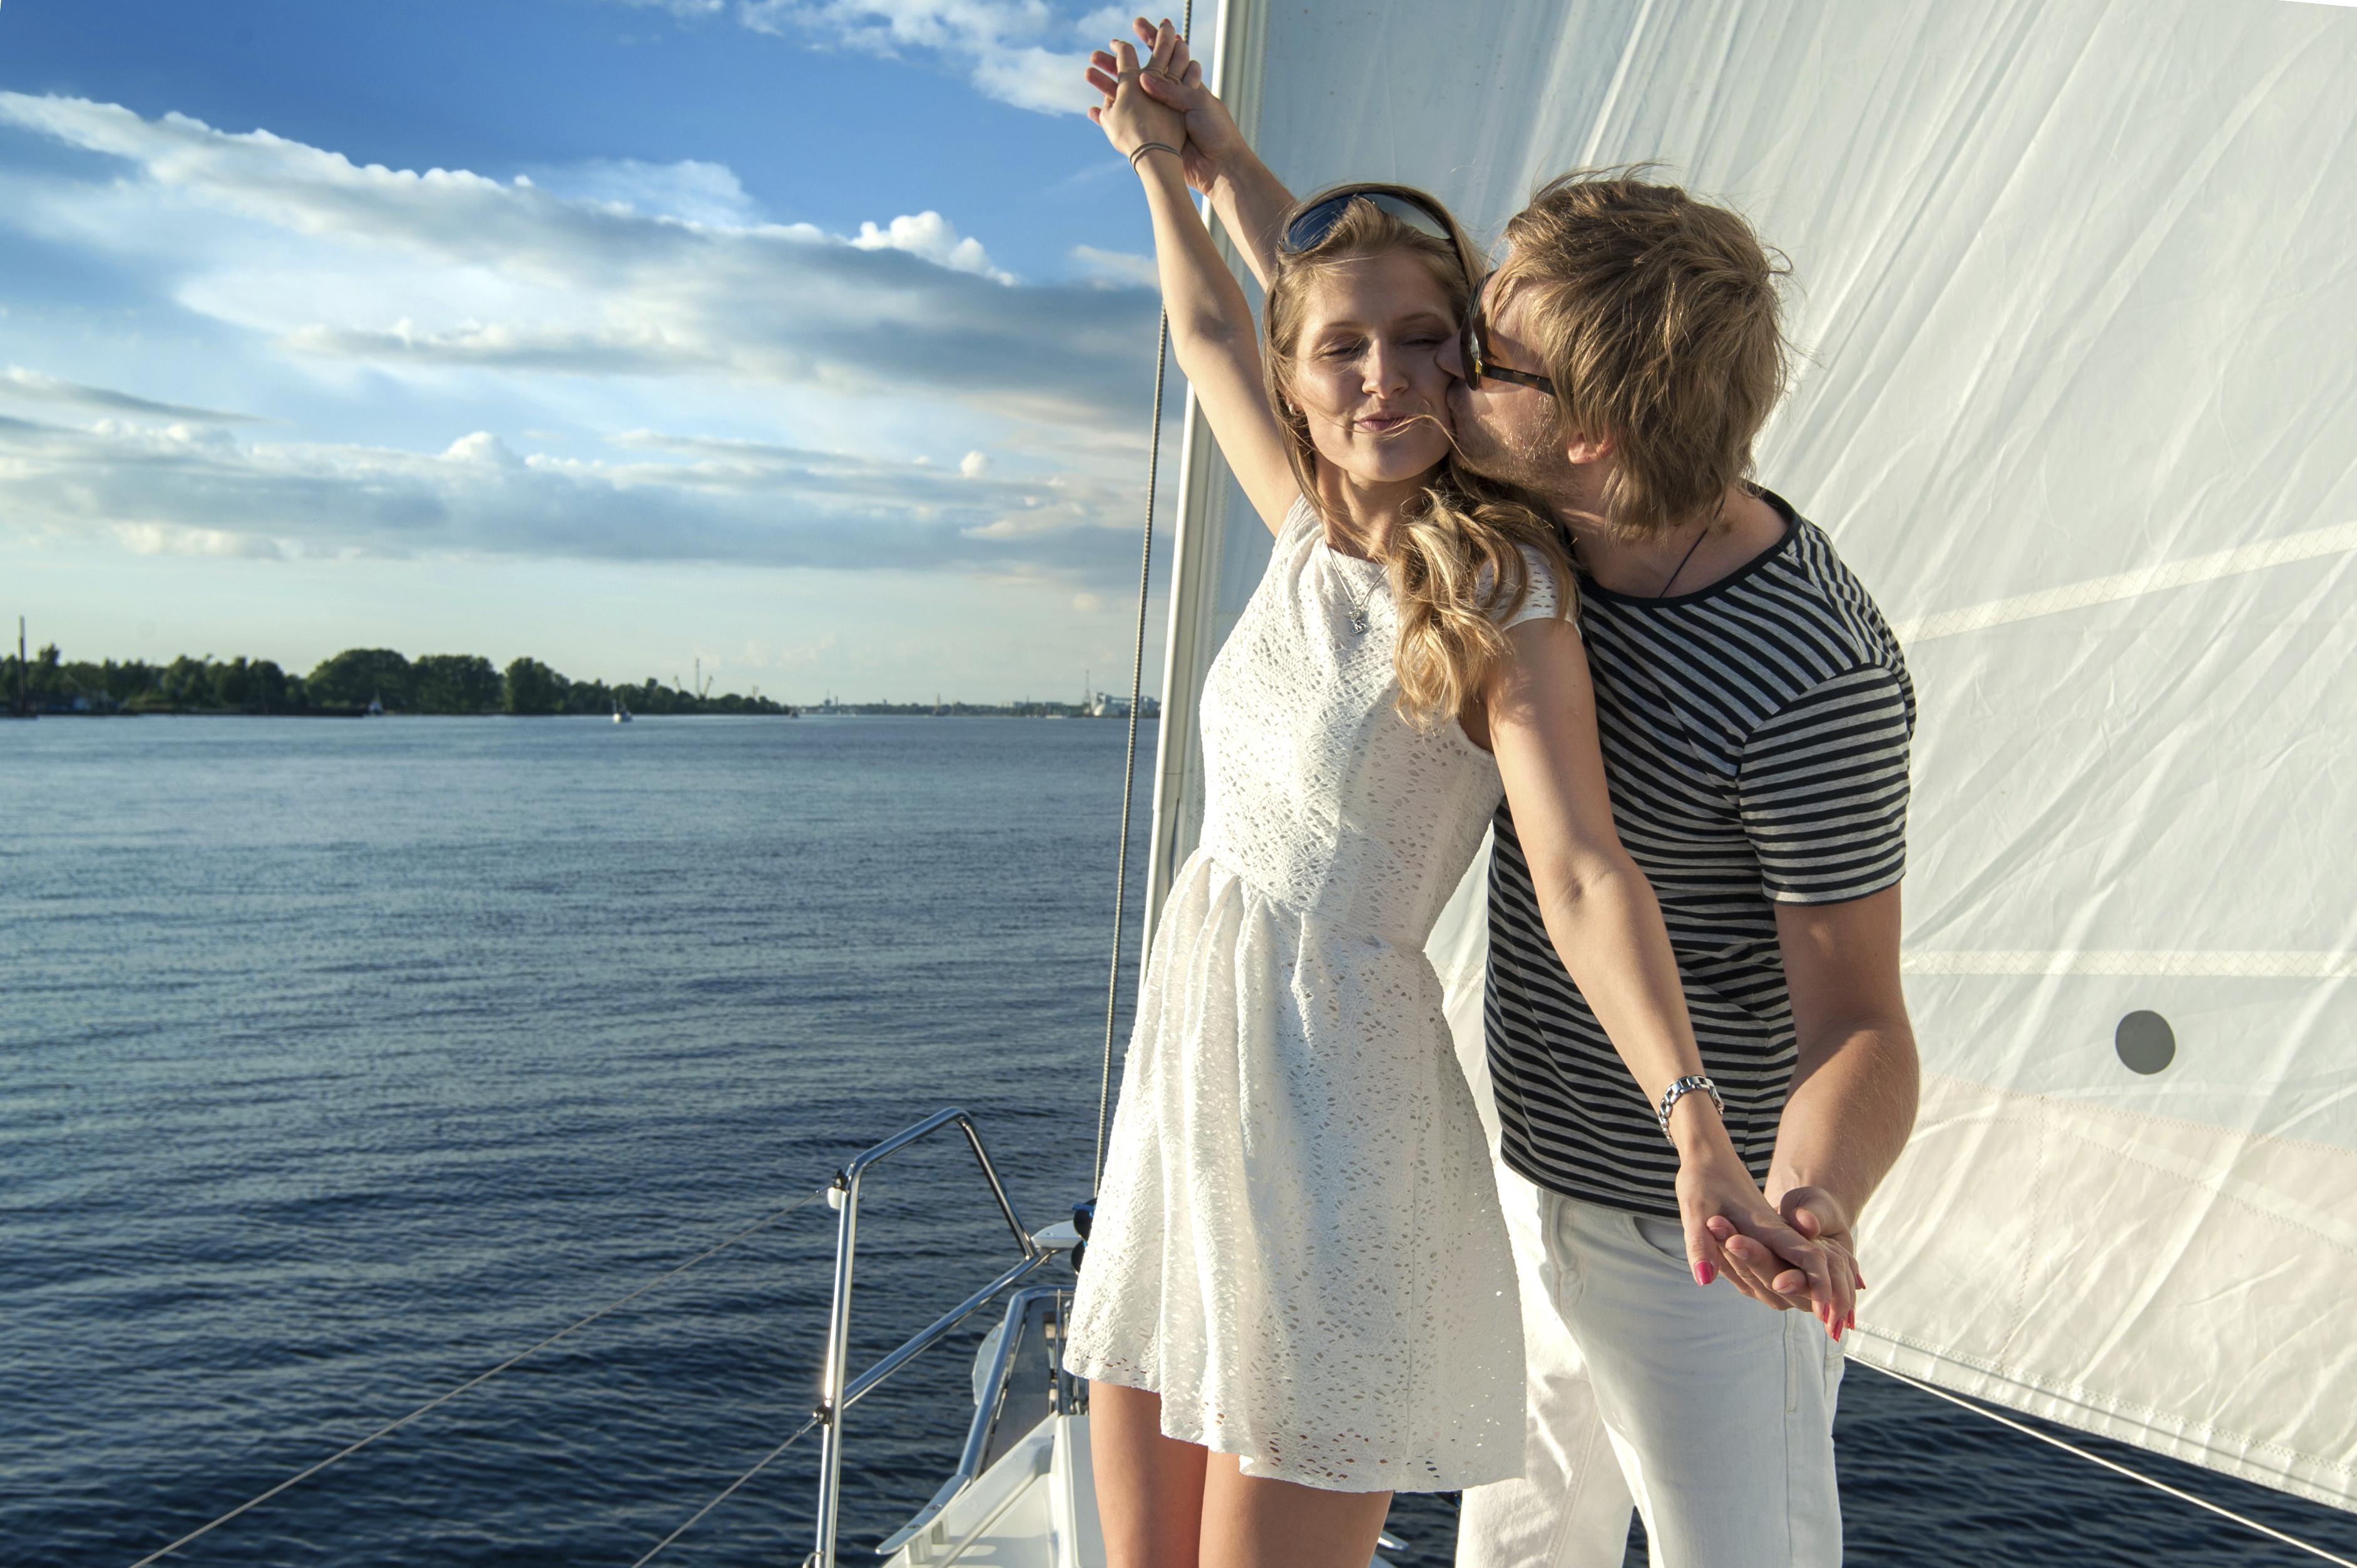 Honeymoon ideas - charter a boat